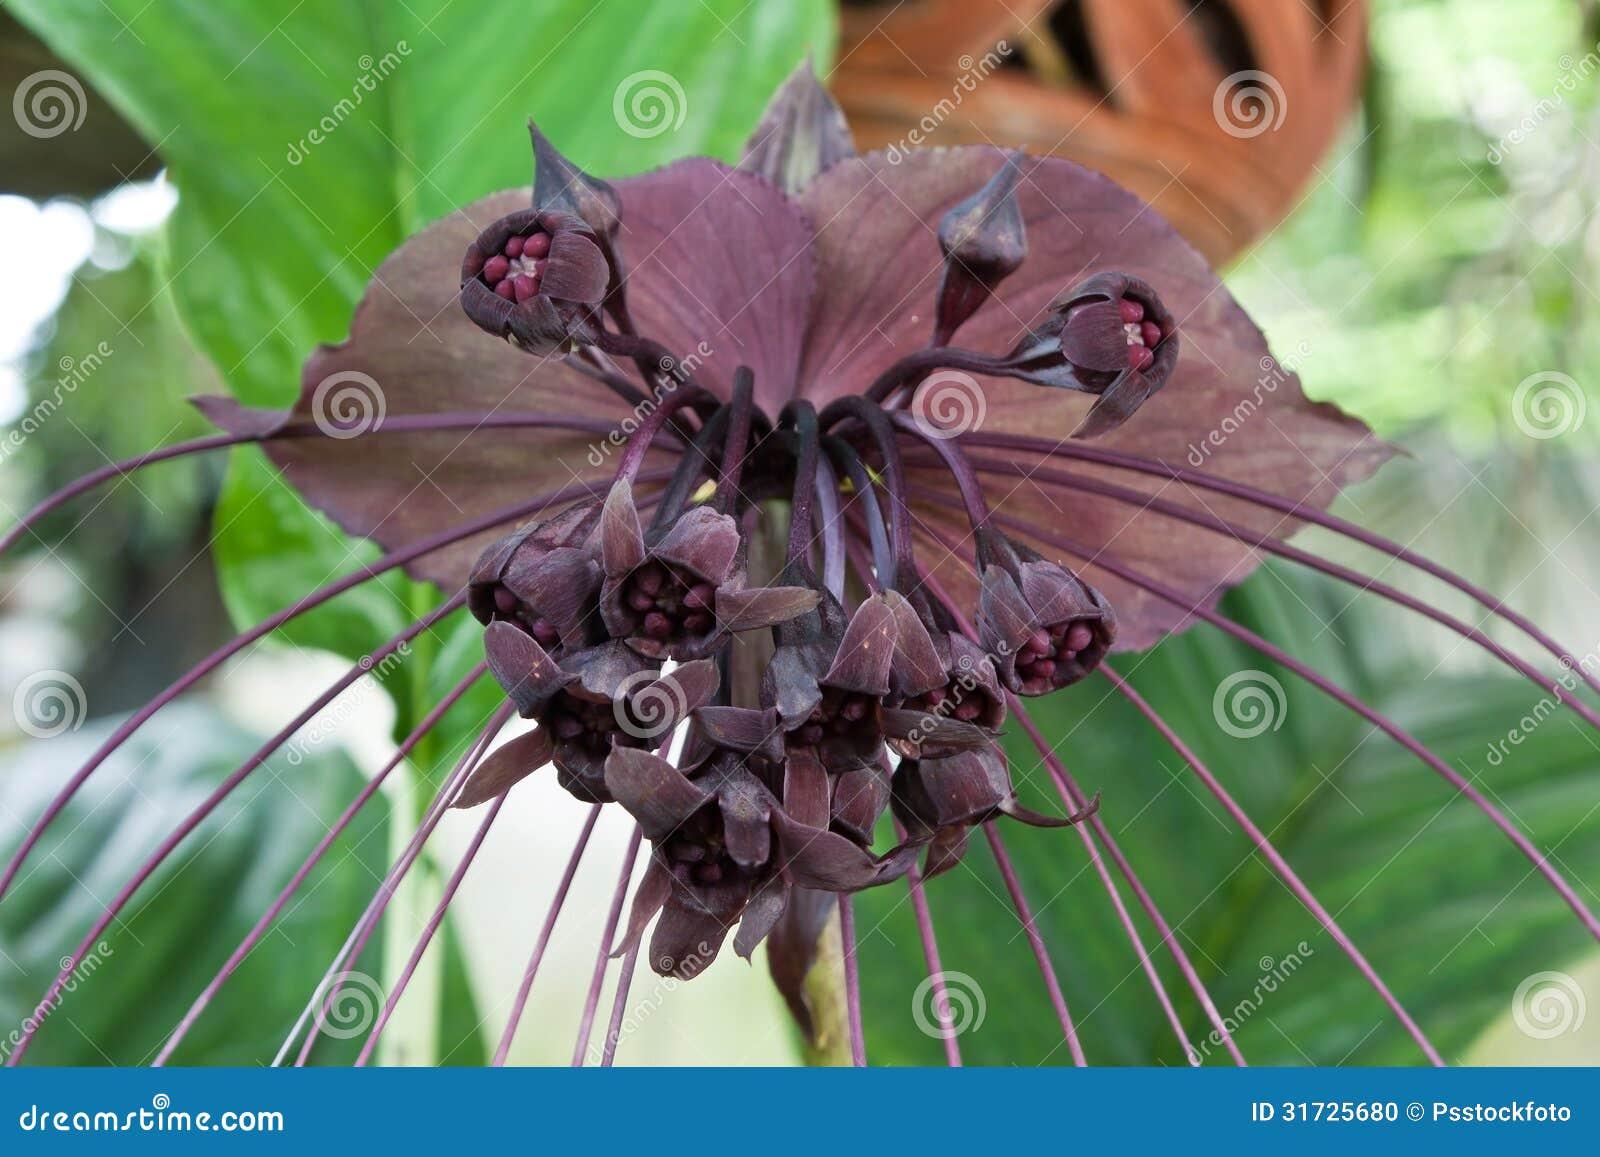 Bat Flower Stock Image